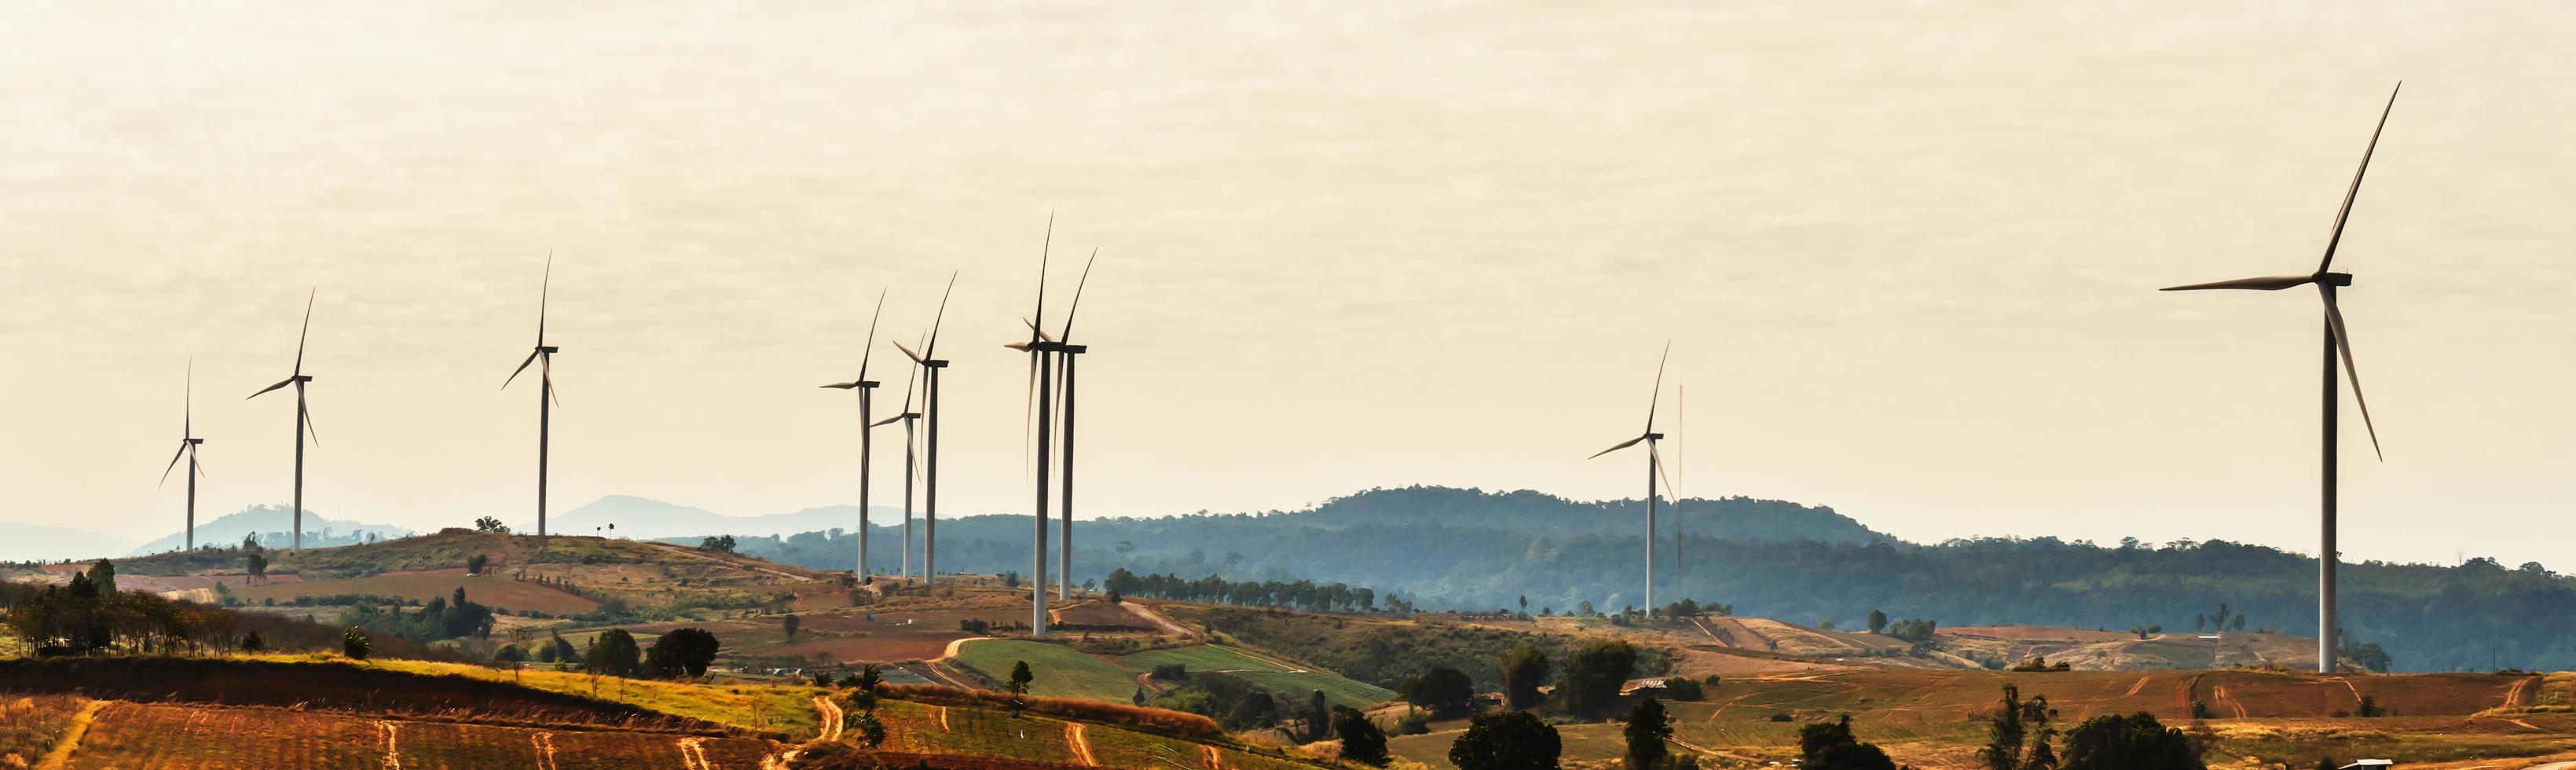 vindkraftverk rör sig på en solig eftermiddag foto